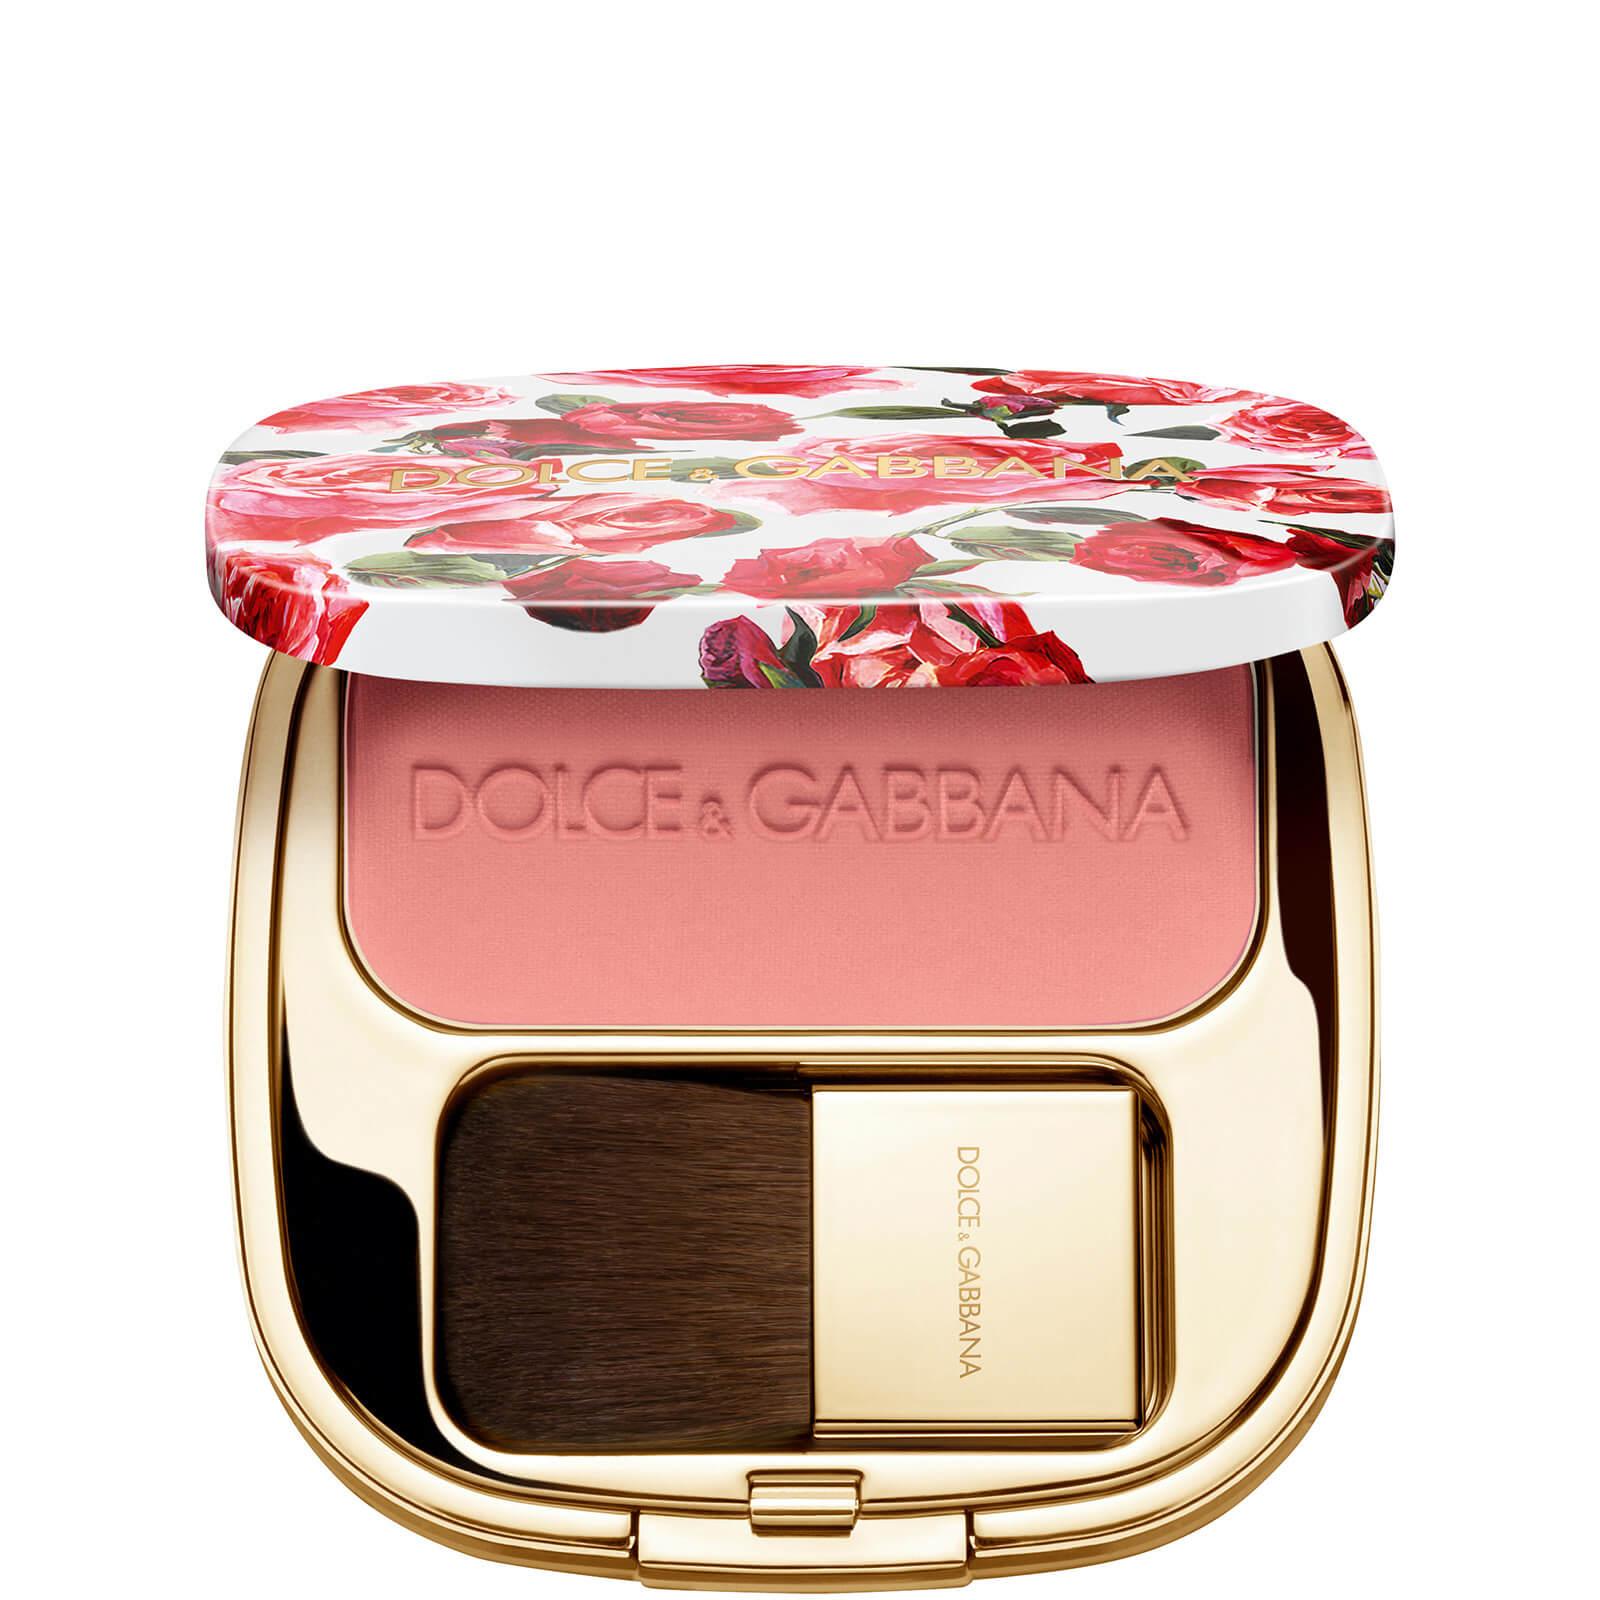 Купить Dolce&Gabbana Blush of Roses Luminous Cheek Colour 5g (Various Shades) - 400 Peach